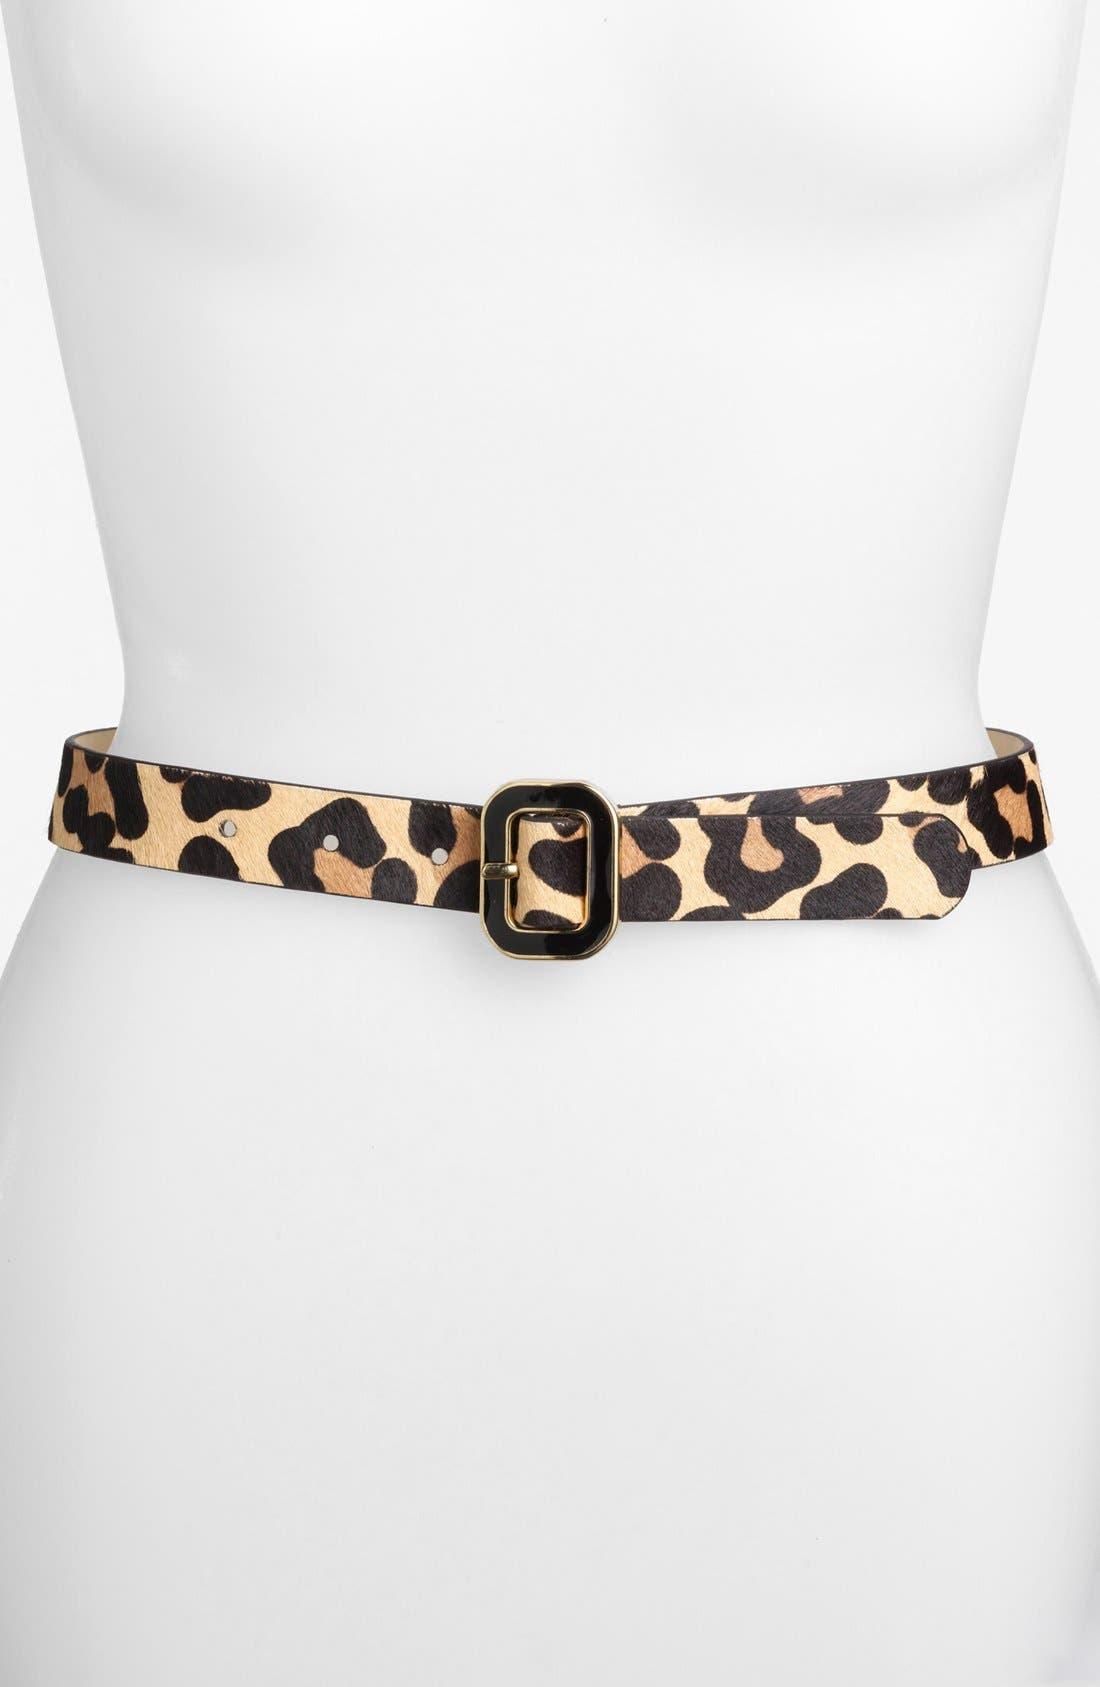 Main Image - Another Line Leopard Print Calf Hair Belt